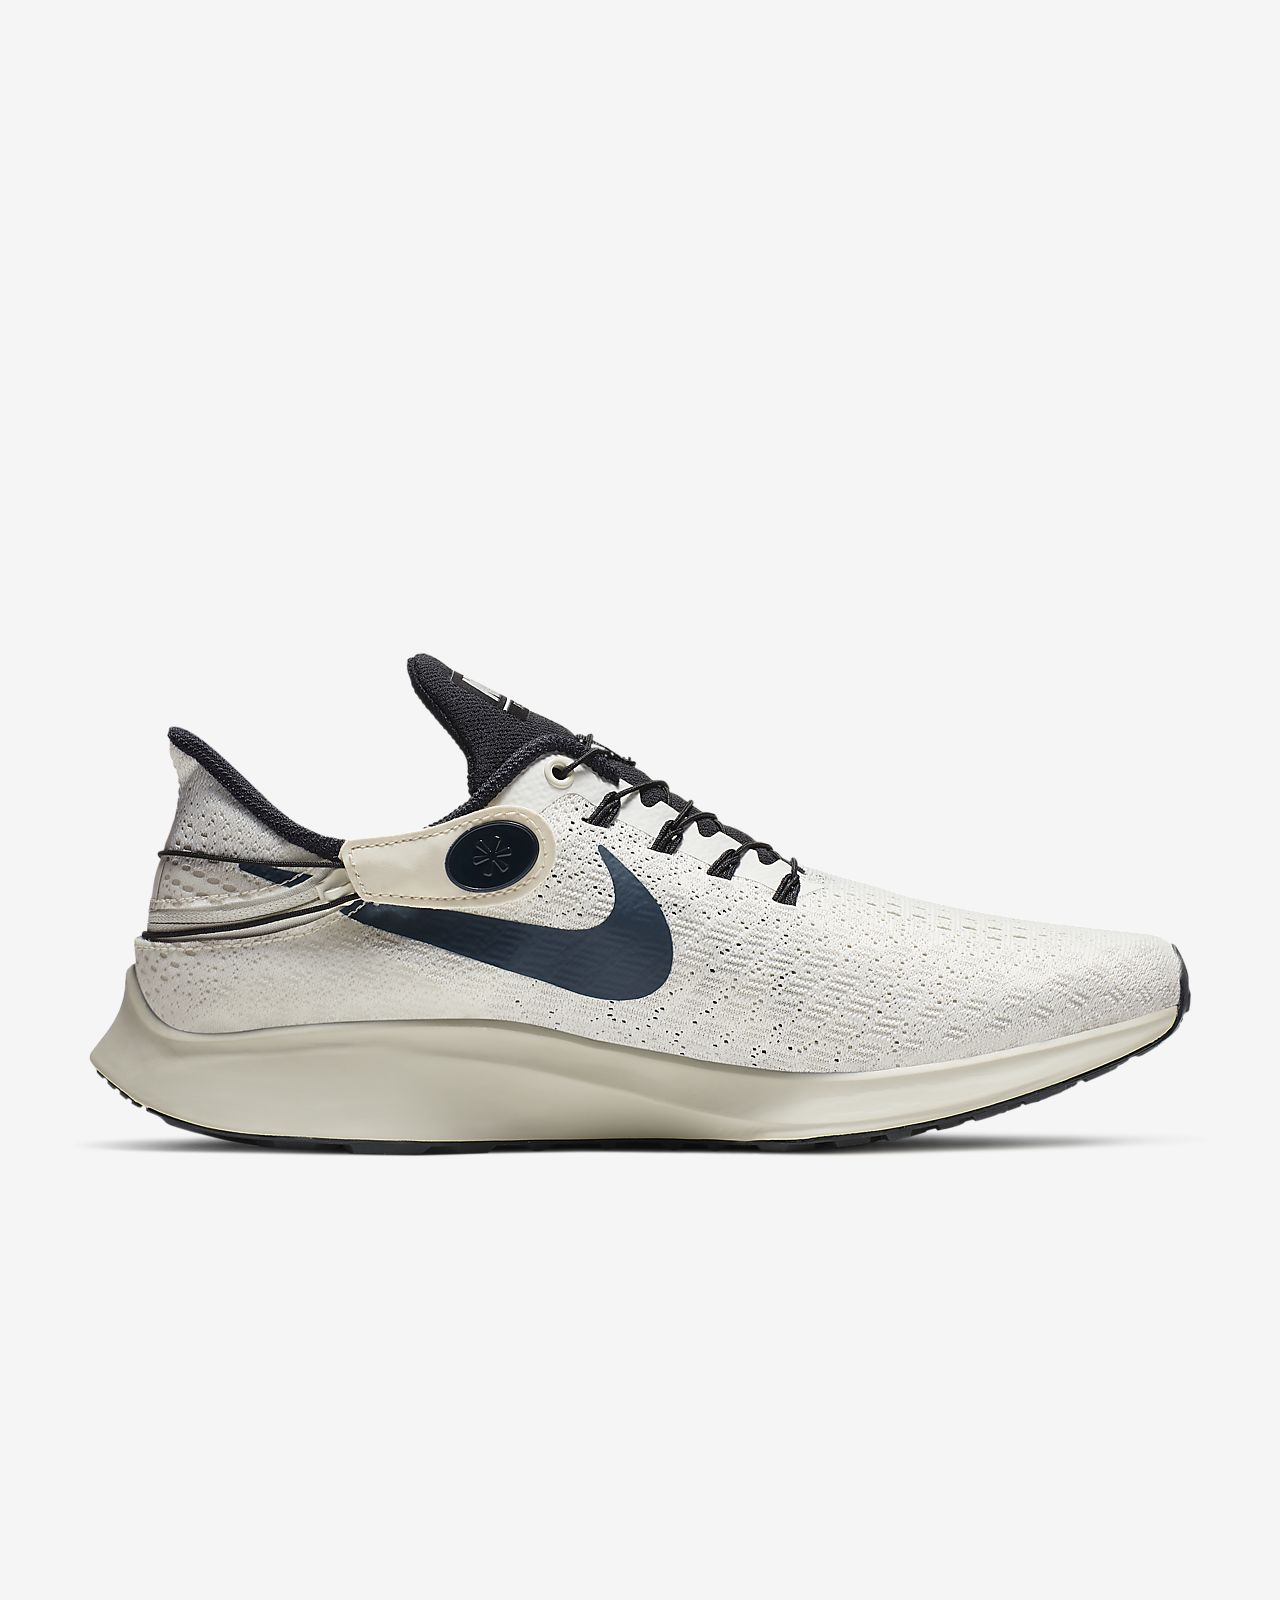 huge discount d644b e0f3f ... Nike Air Zoom Pegasus 35 FlyEase Men s Running Shoe